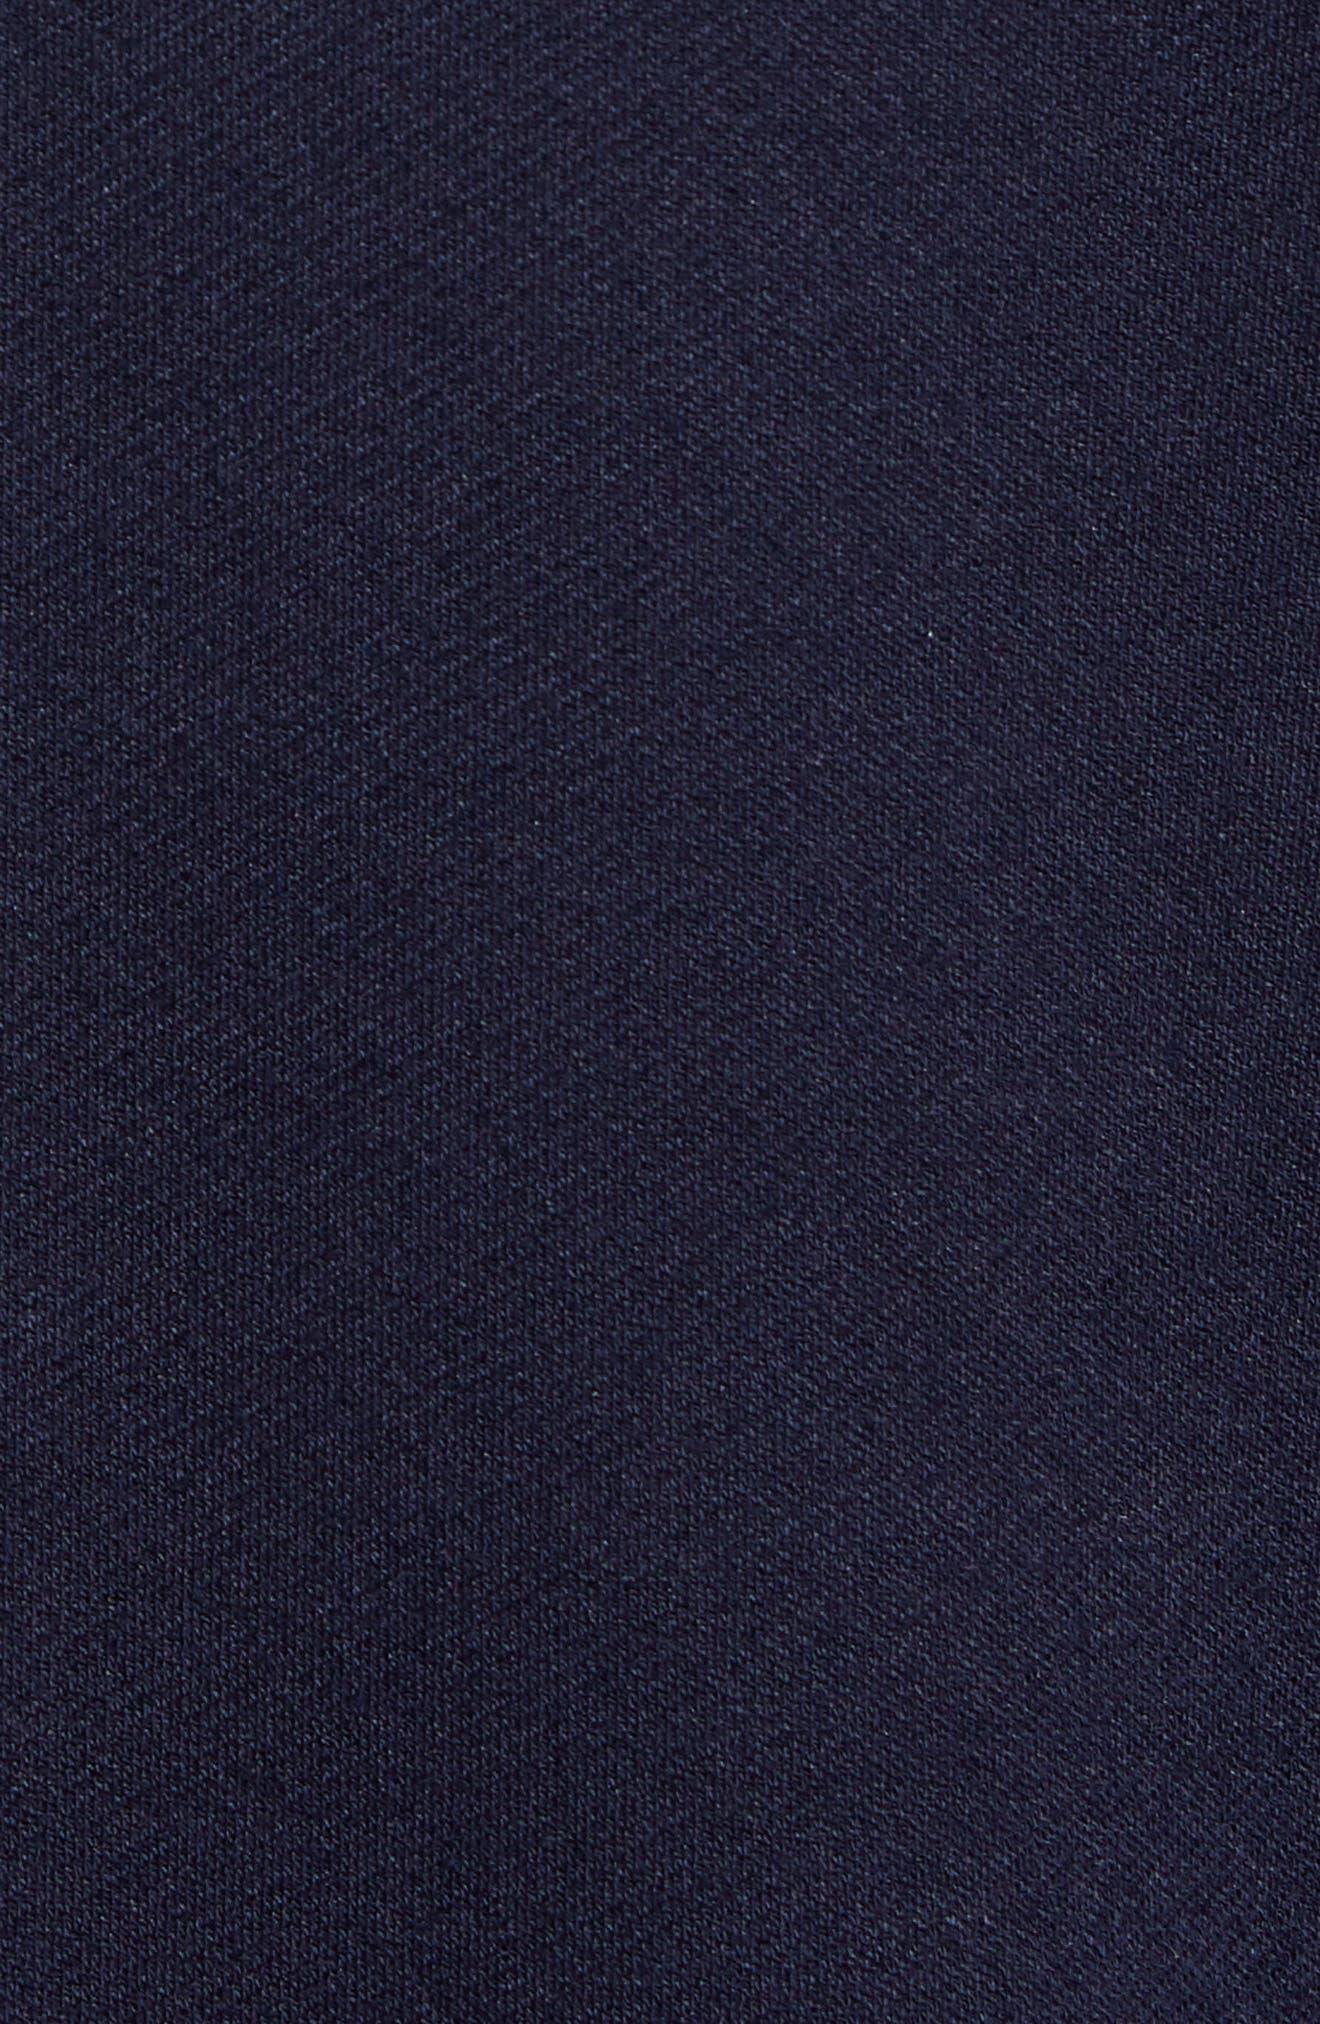 Zip Front Shirt Jacket,                             Alternate thumbnail 7, color,                             NAVY NIGHT